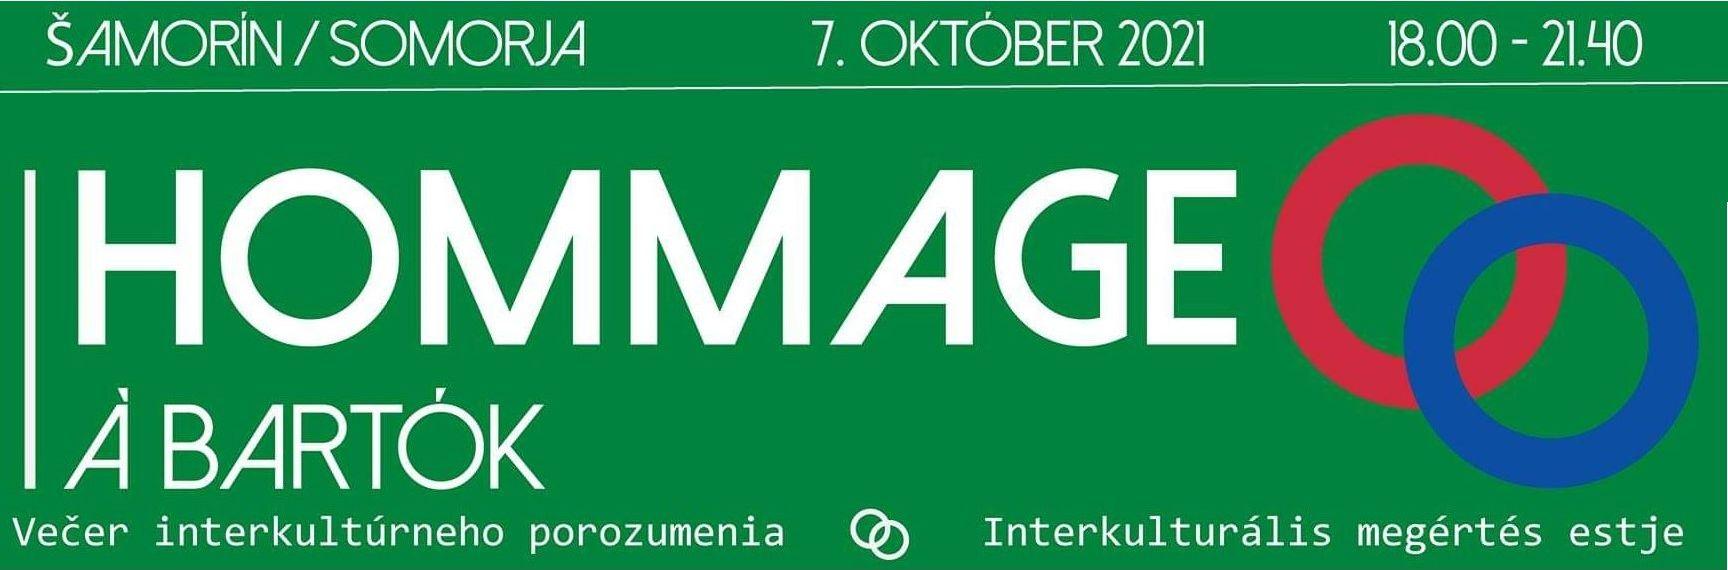 Hommage à Bartók – Šamorín – 7.10.2021 – 18:00